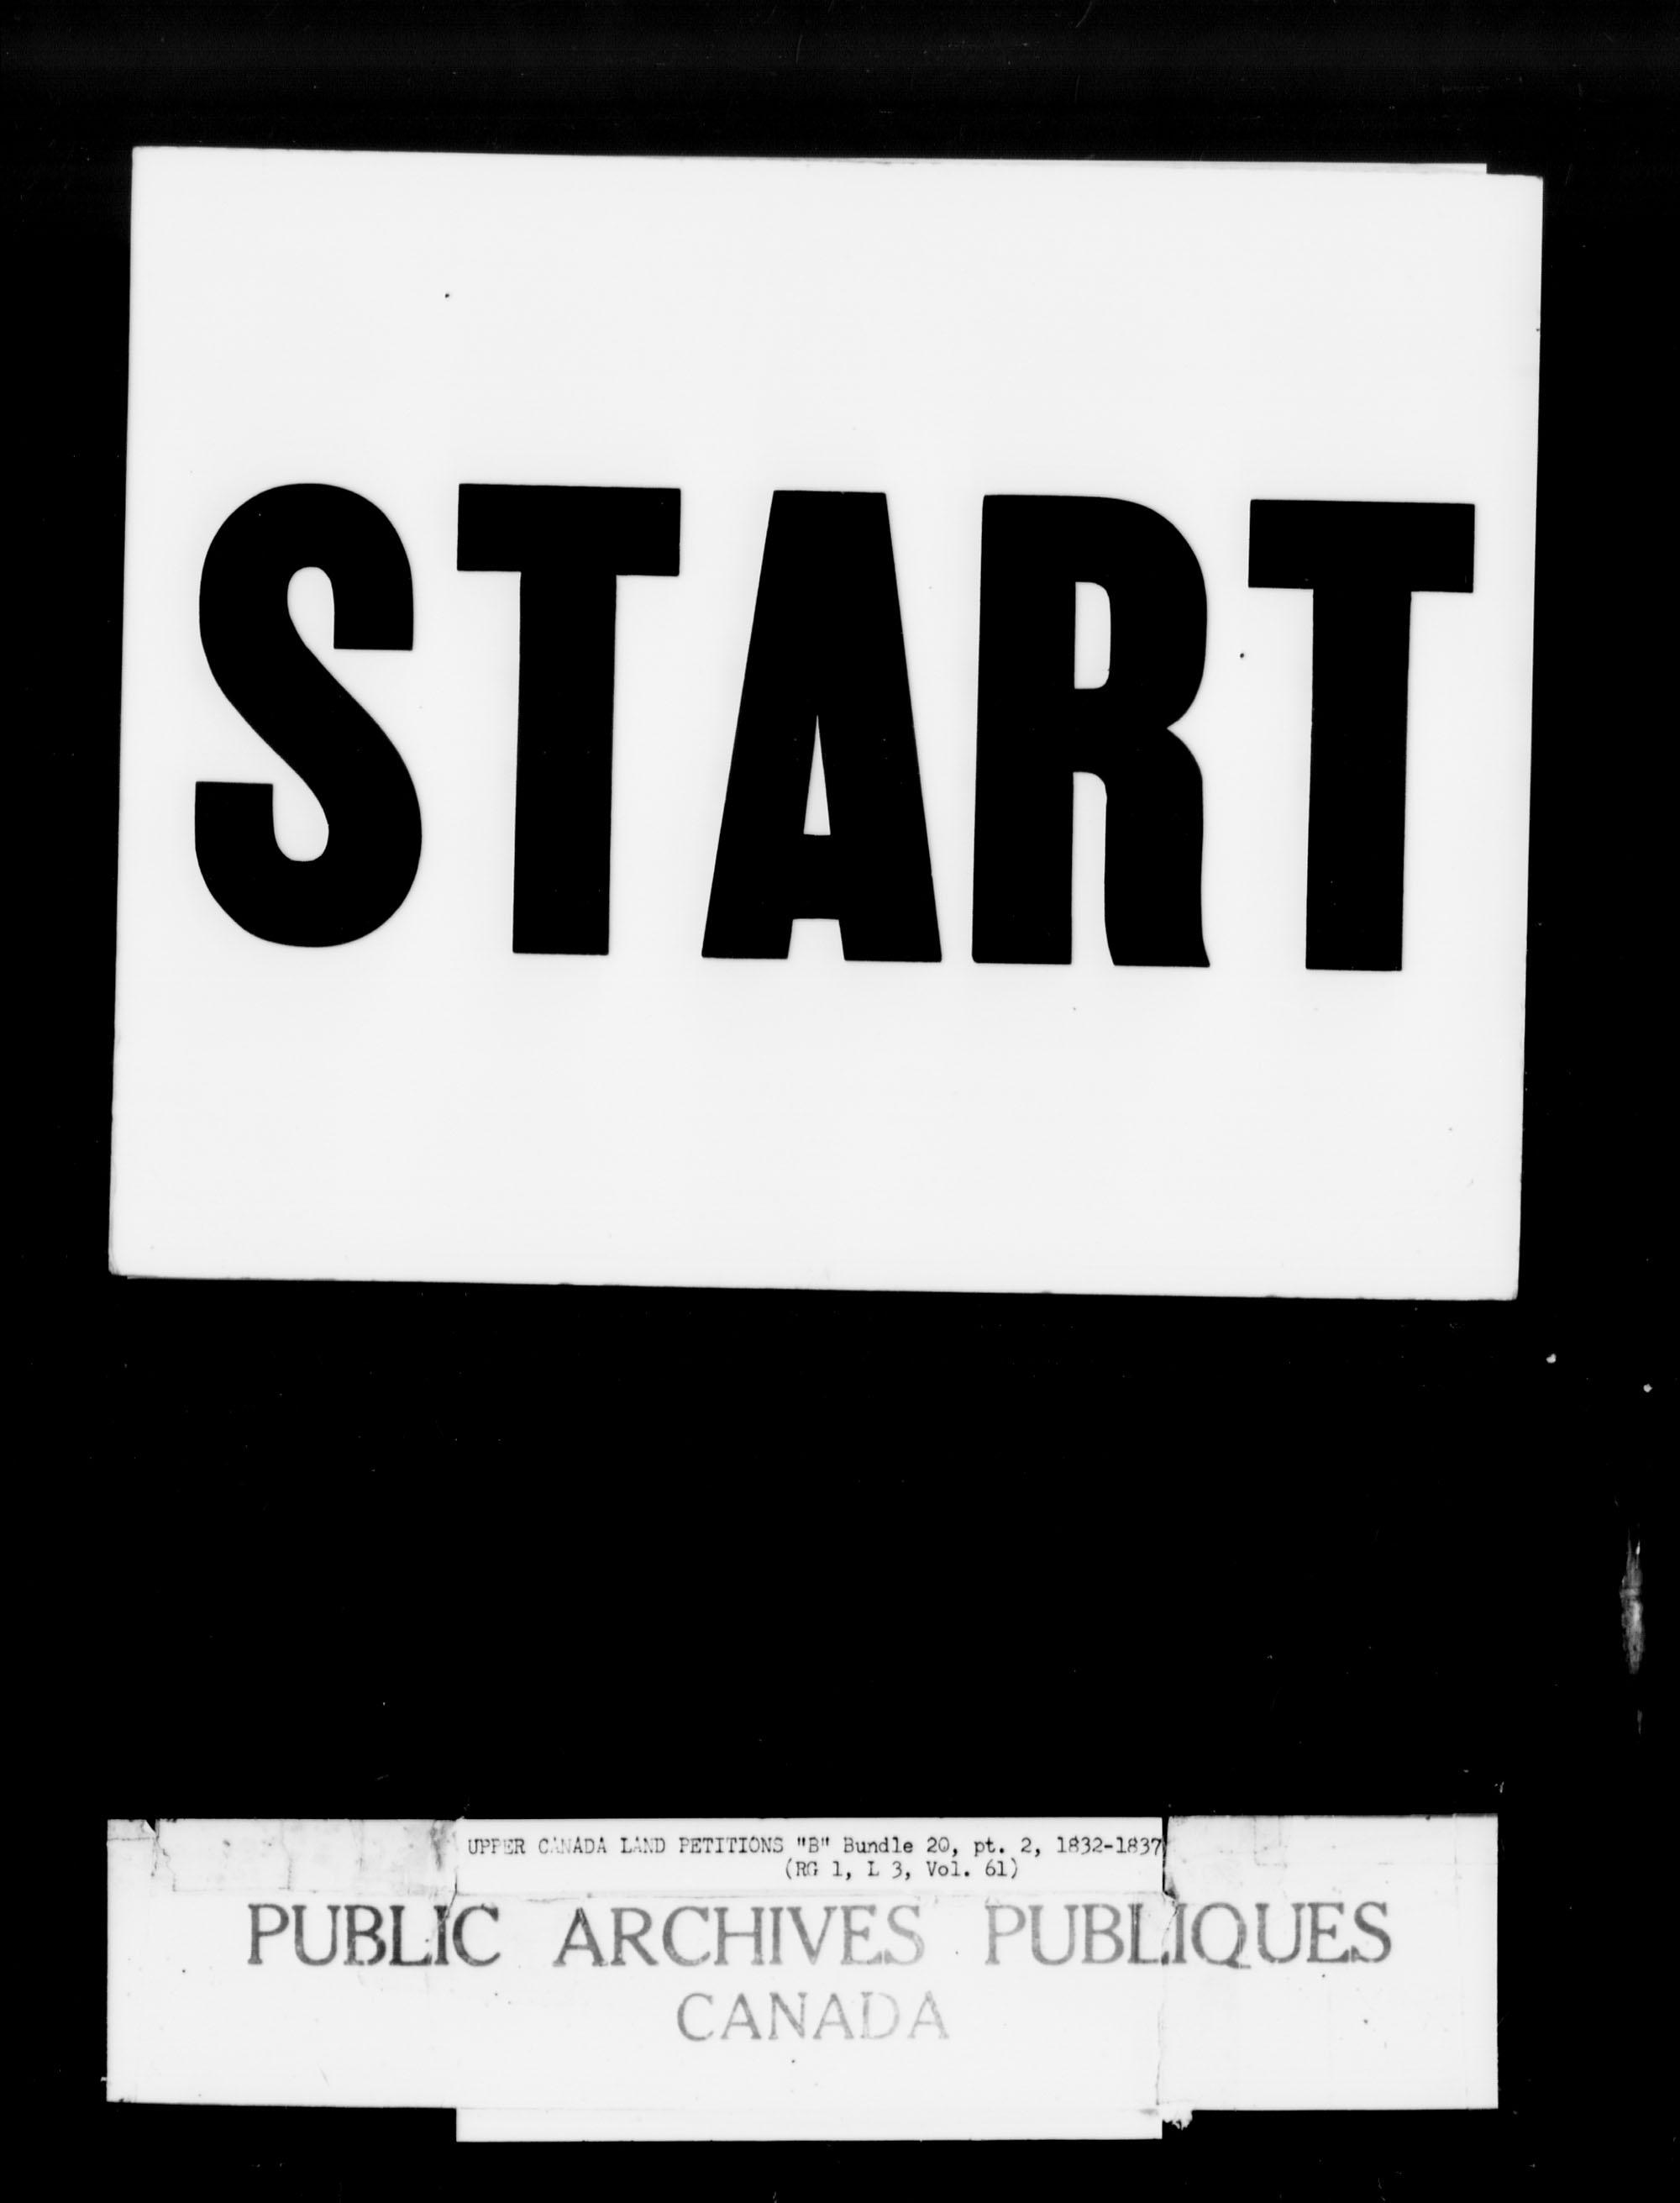 Titre: Demandes de terres du Haut-Canada (1763-1865) - N° d'enregistrement Mikan: 205131 - Microforme: c-1633